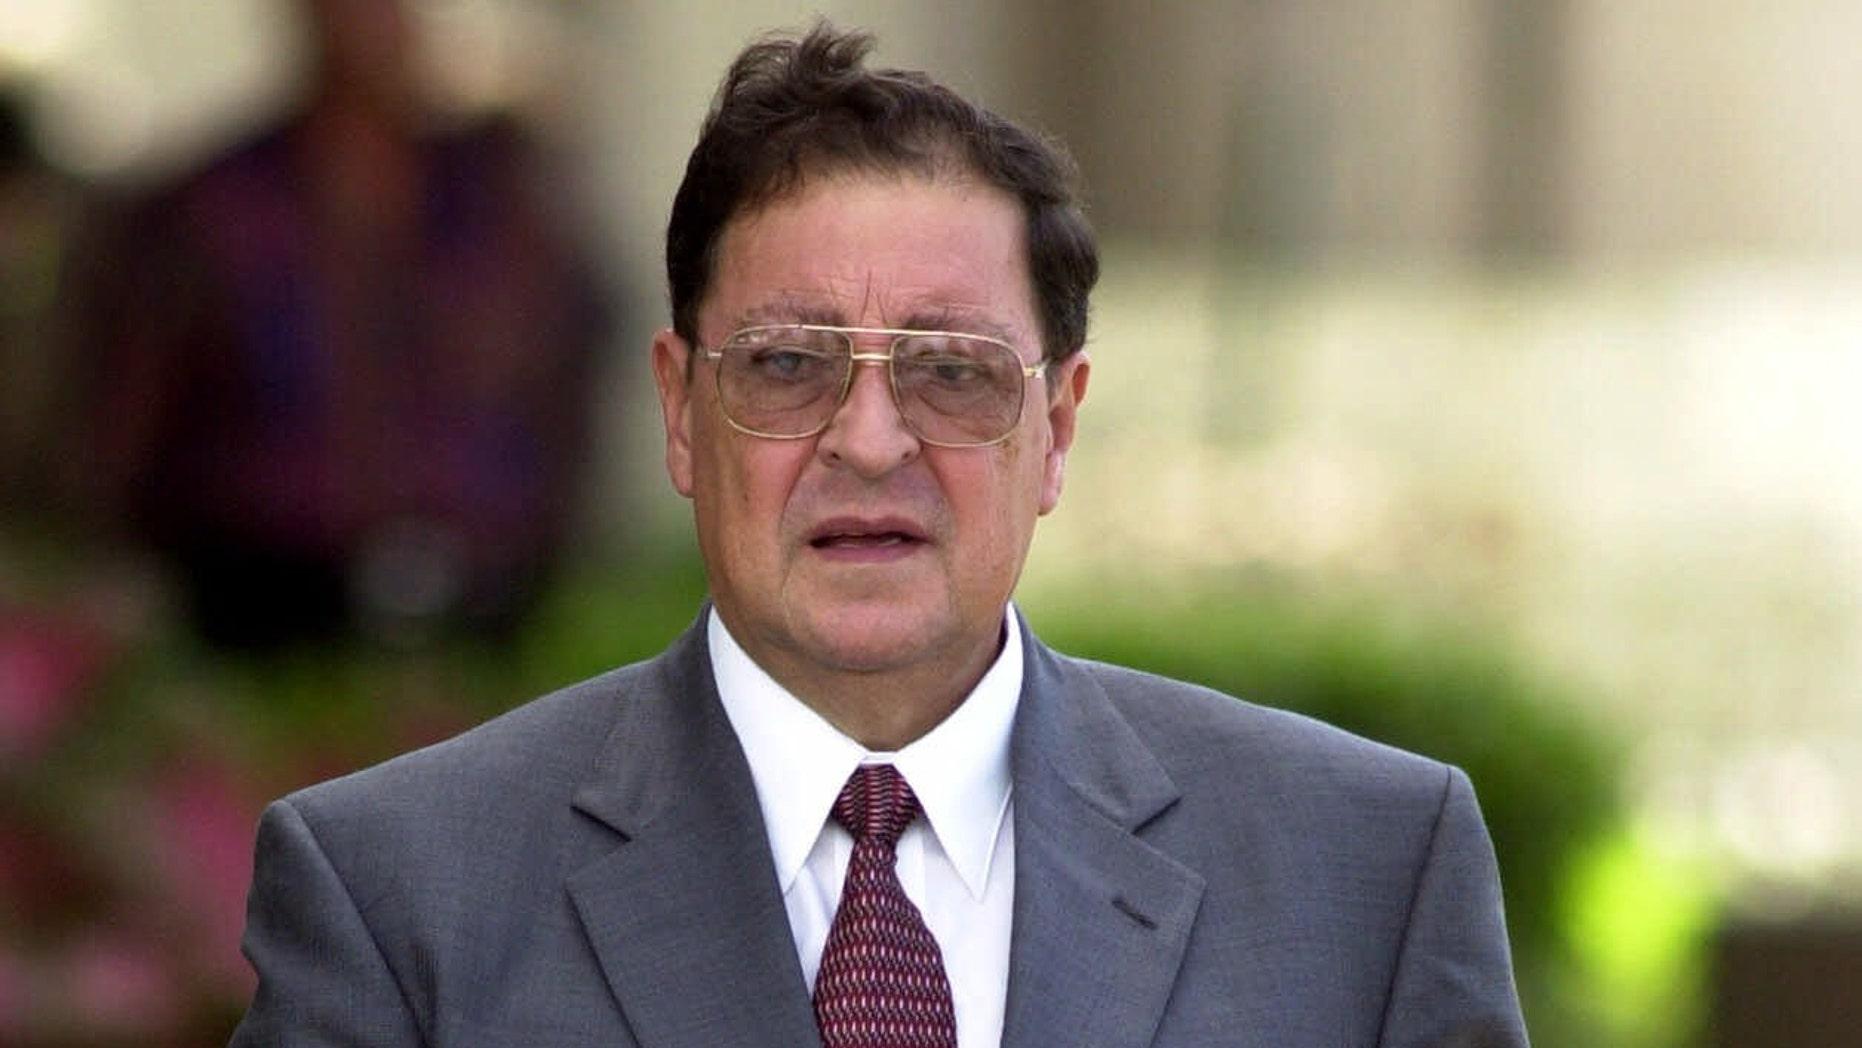 Former defense minister of El Salvador, Carlos Eugenio Vides Casanova, leaves federal court in Palm Beach, Fla.